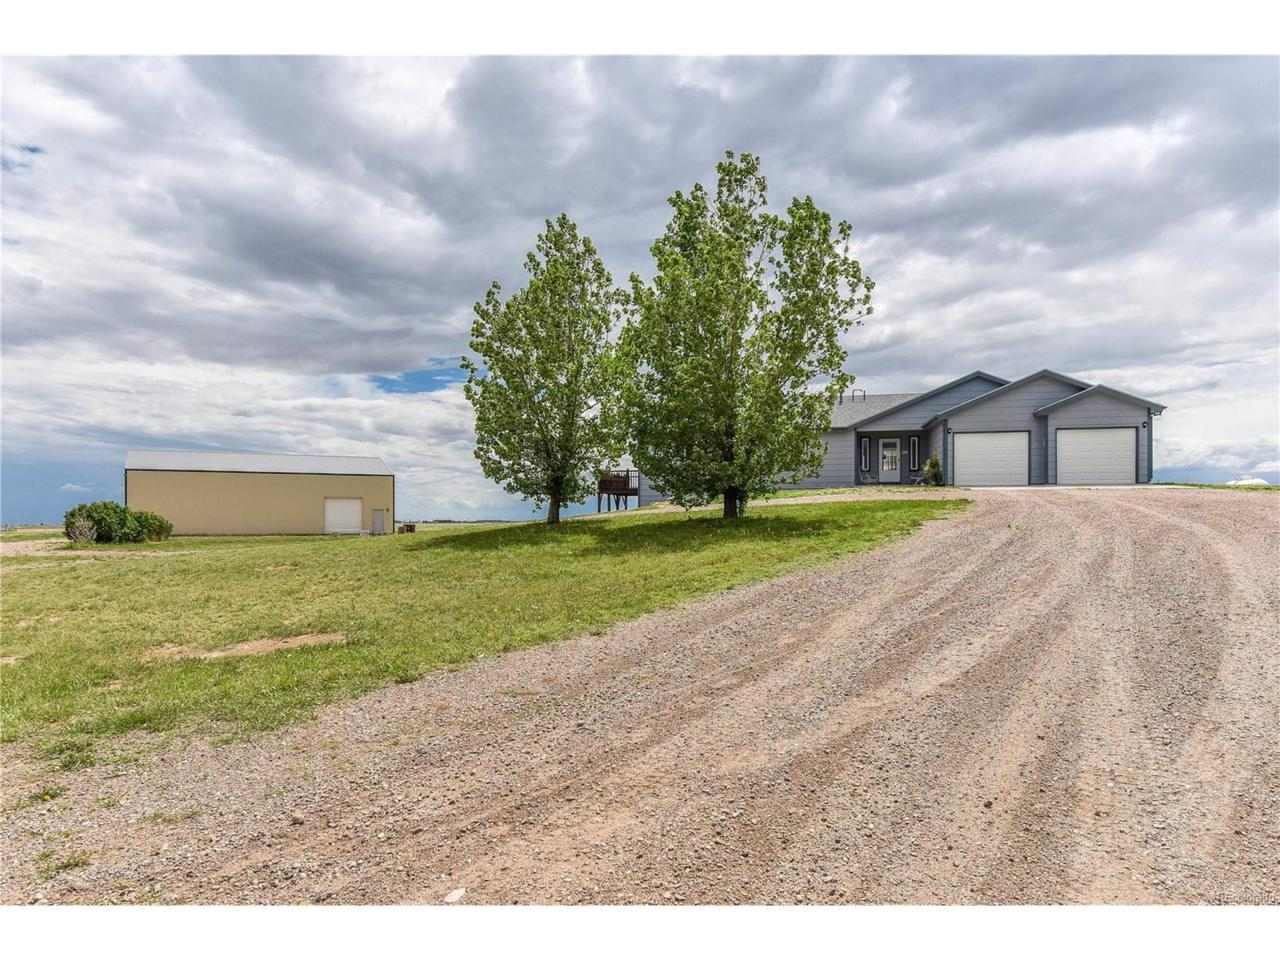 16354 County Road 100, Nunn, CO 80648 (MLS #5903338) :: 8z Real Estate